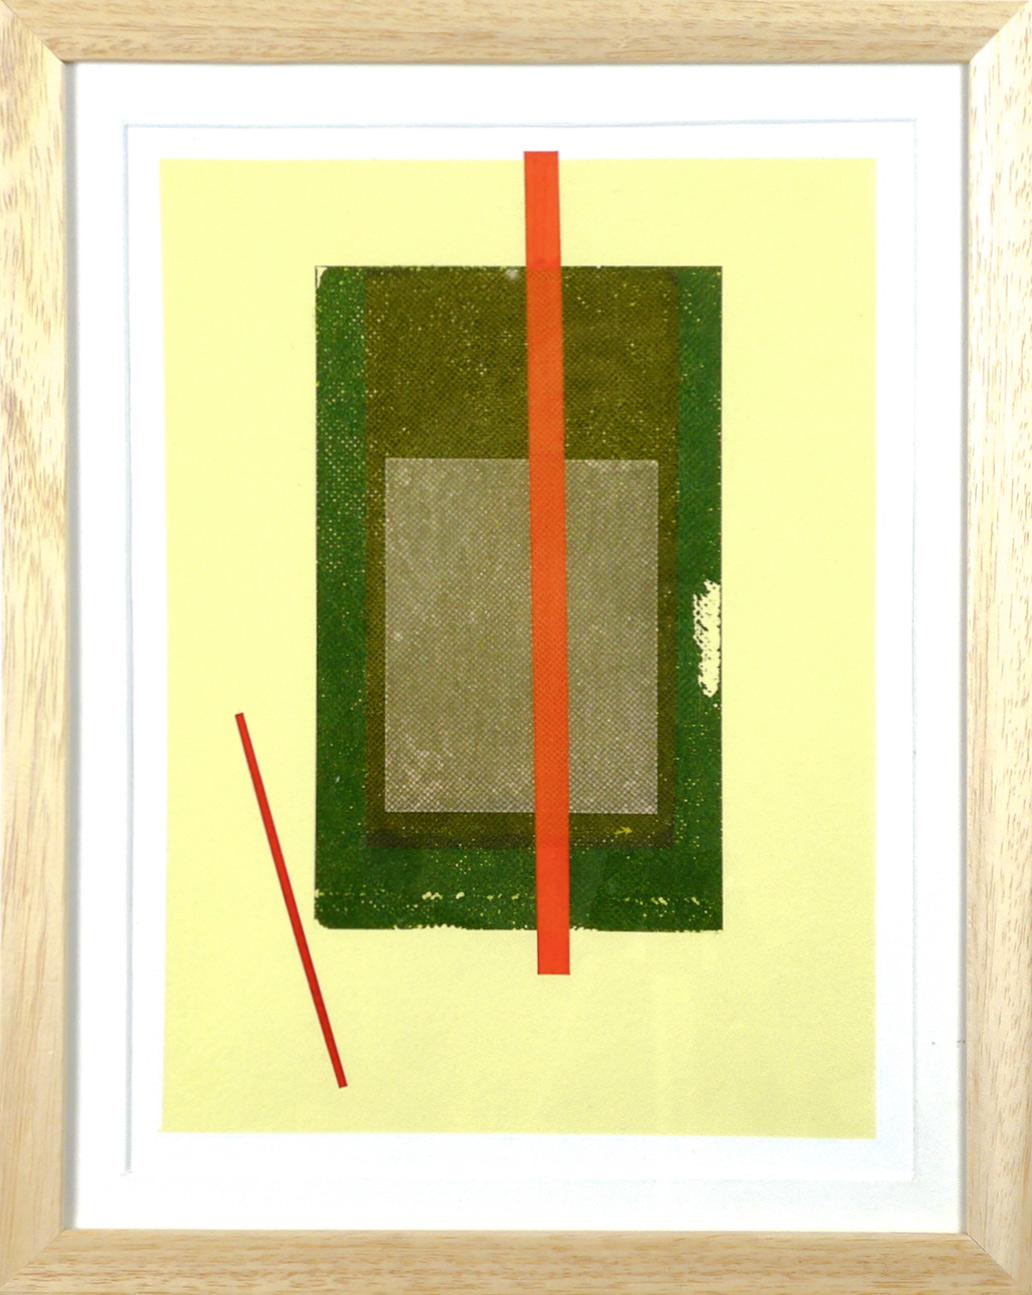 Carlos Stoffel - Tableau - Jaune rectangle vert